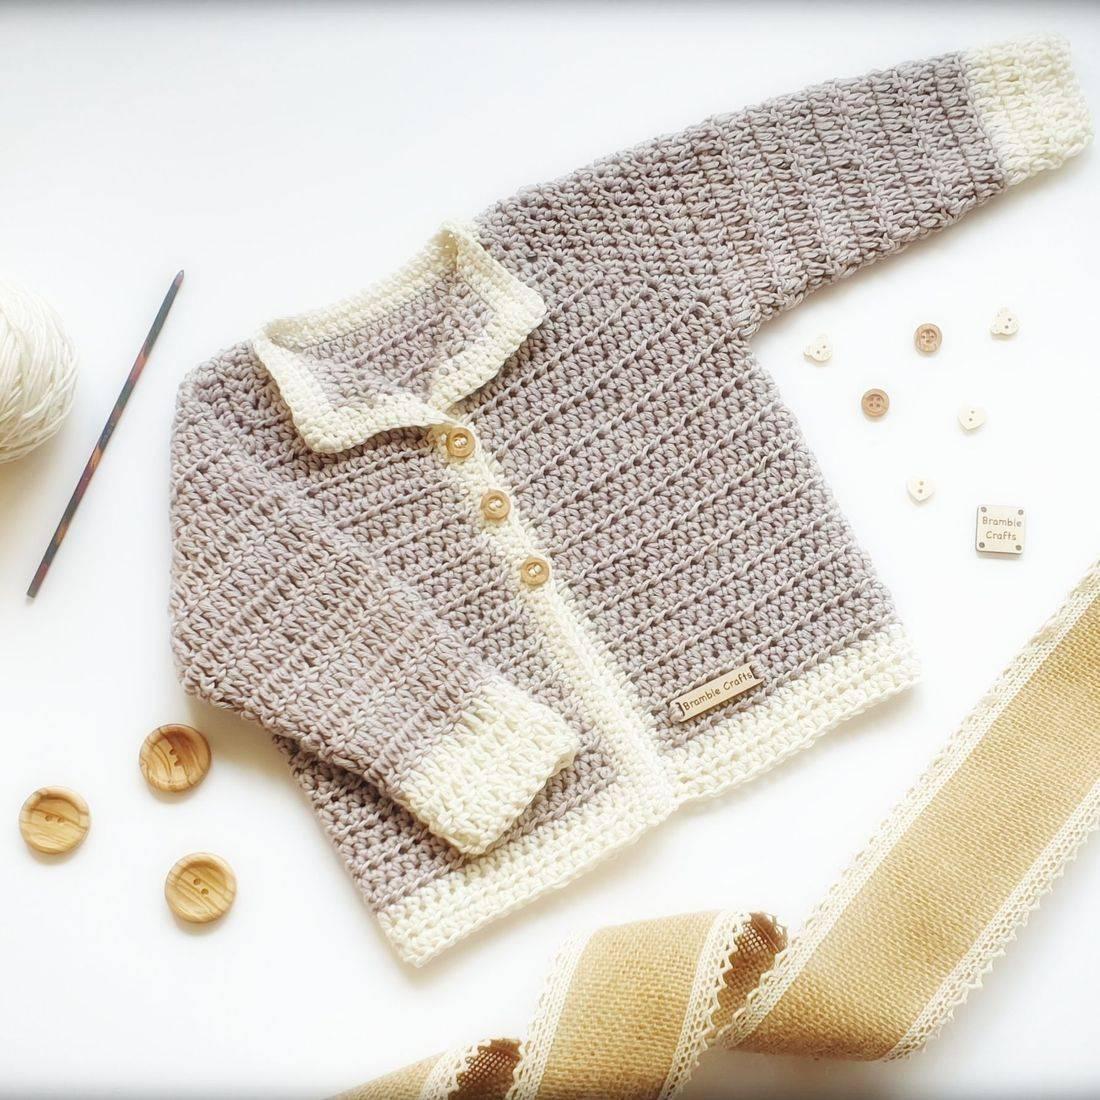 royal baby, baby sussex, vegan crochet, newborn cardigan, crochet cardigan